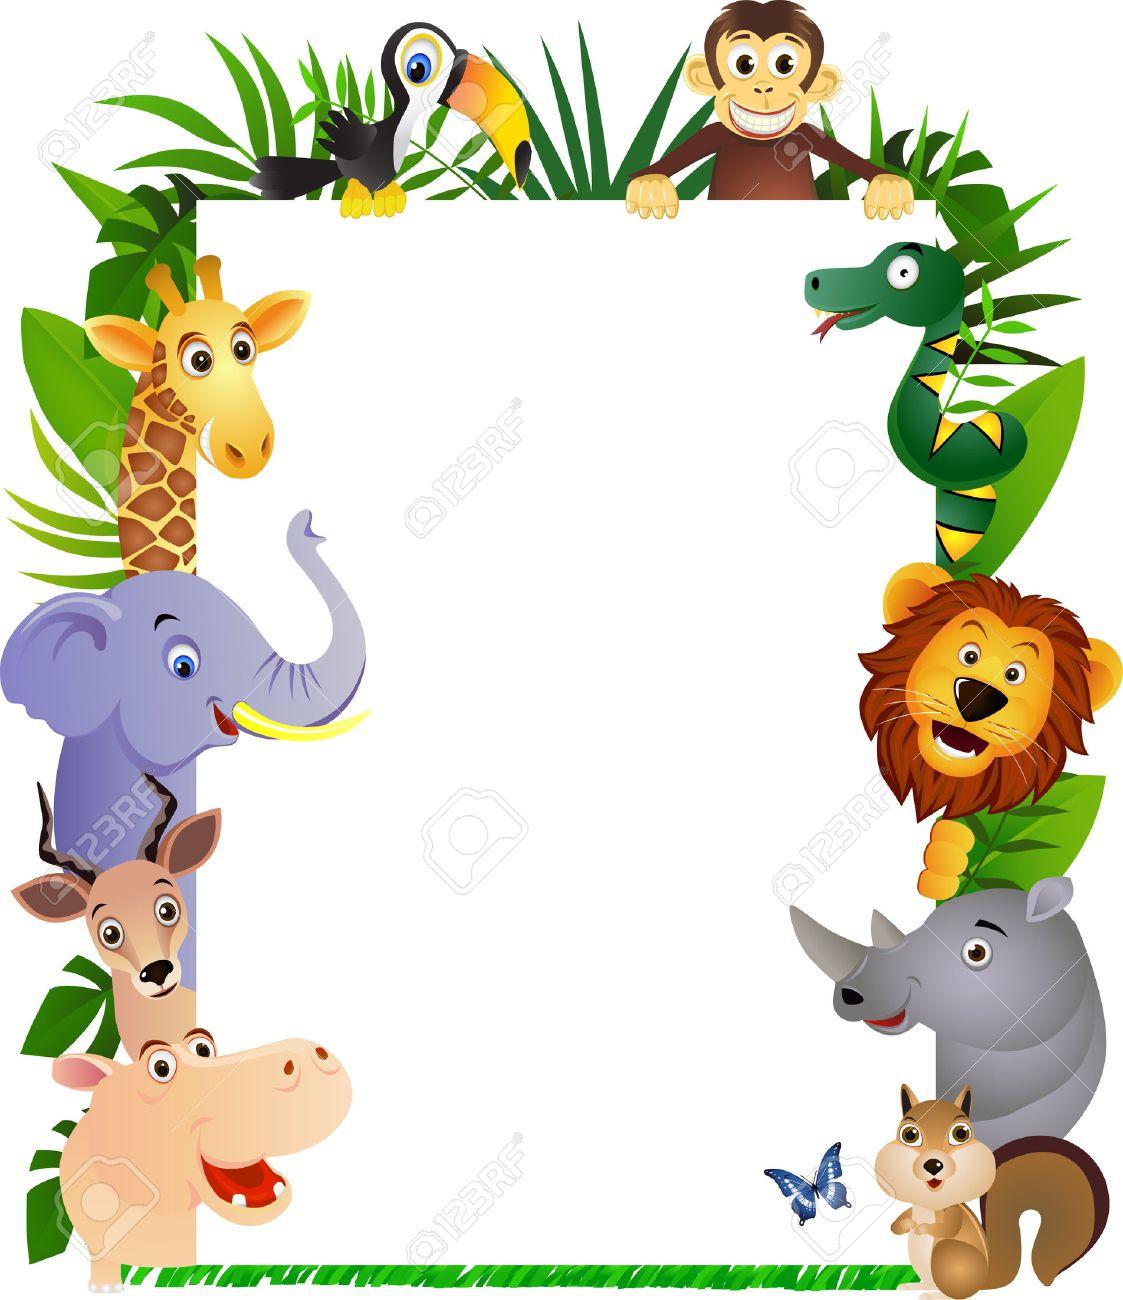 Funny Cartoon Animal Frame Royalty Free Cliparts, Vectors, And Stock ...